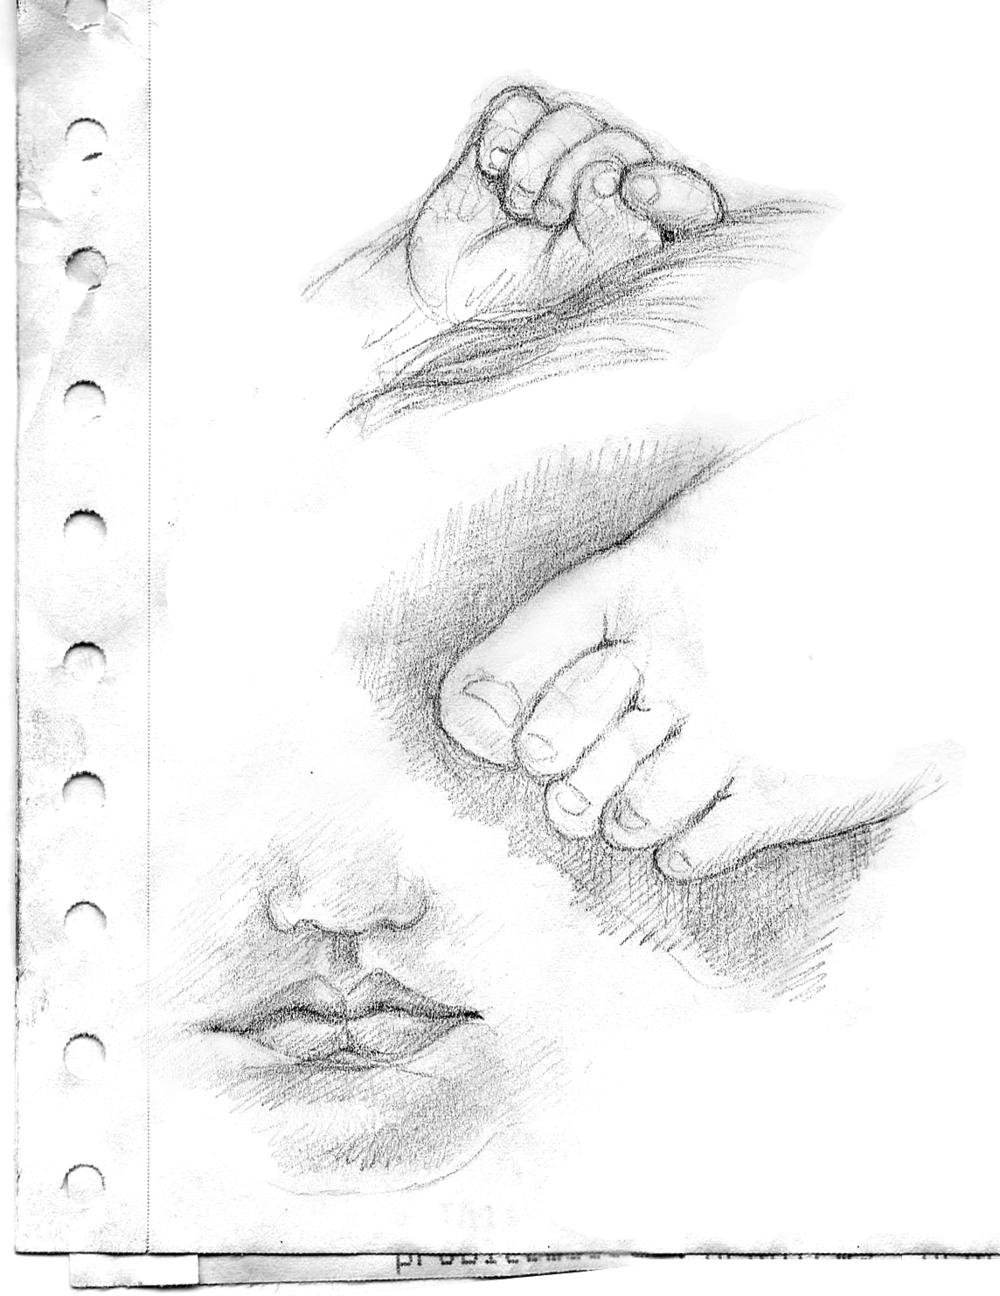 magnus_hand&foot&face.jpg